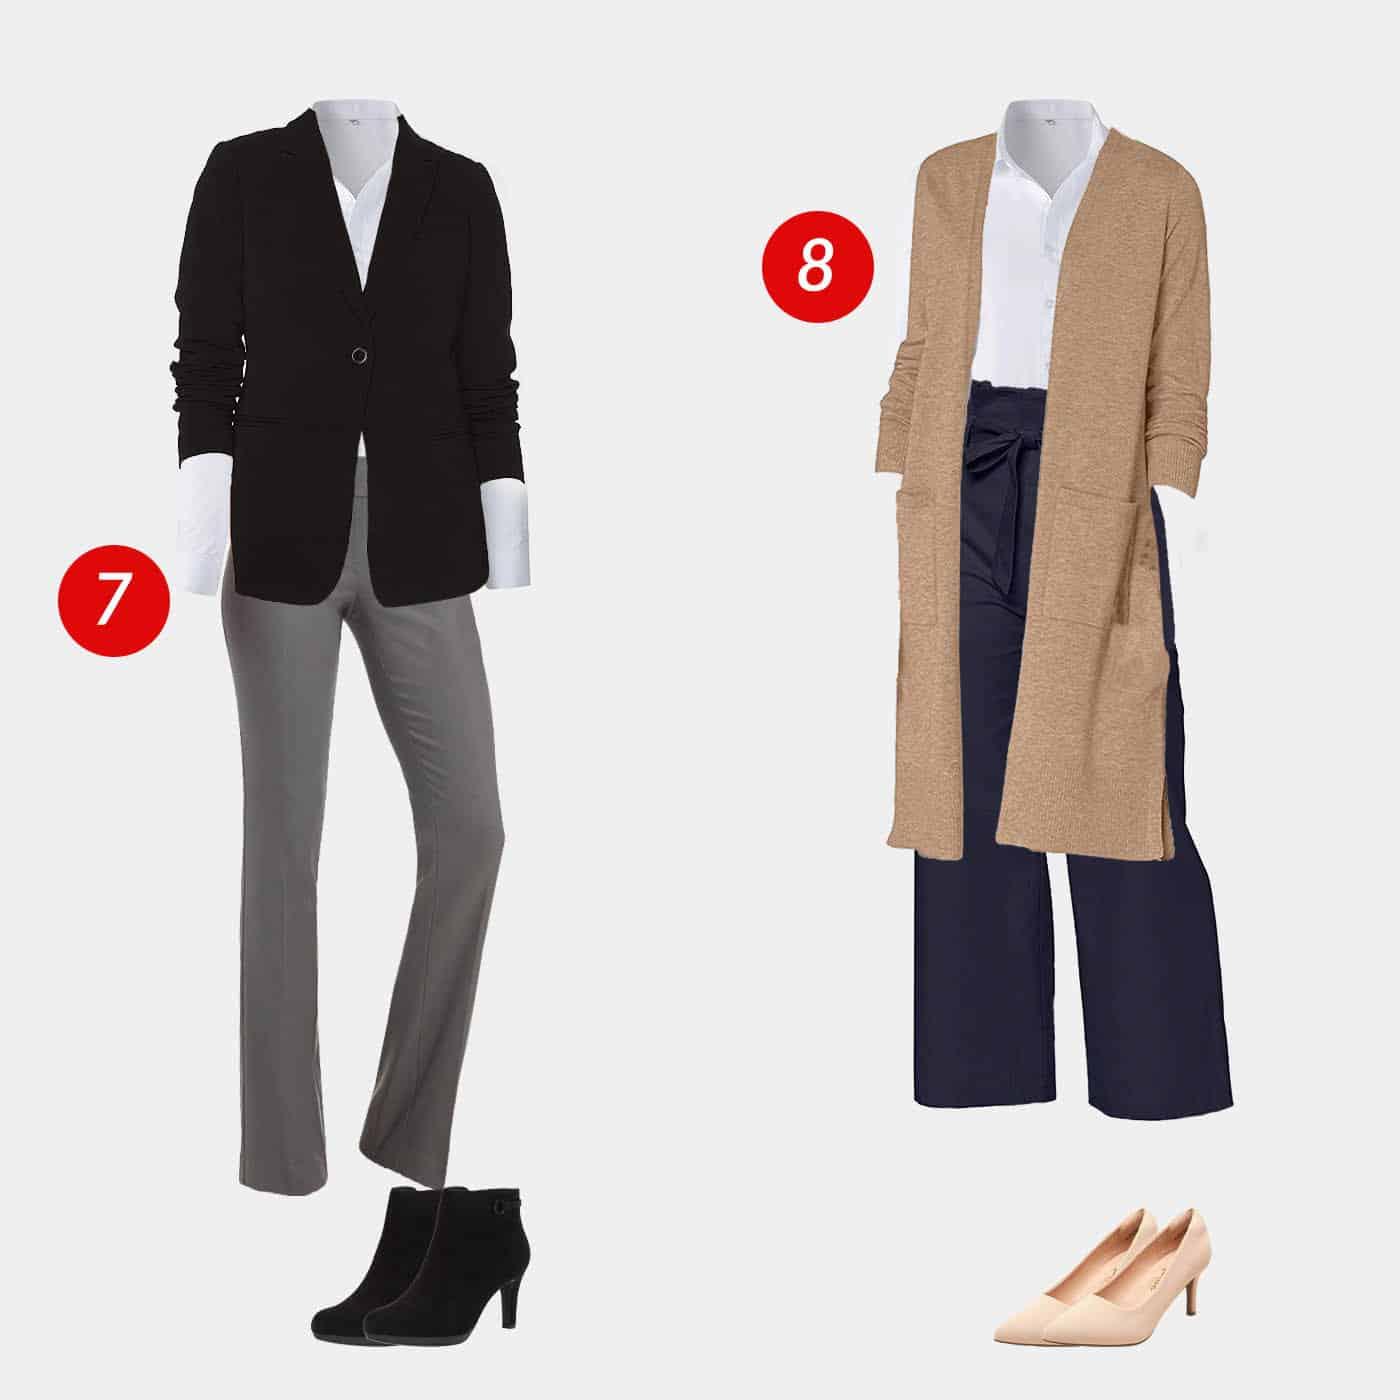 18 Piece Business Casual Amazon Capsule Wardrobe 5